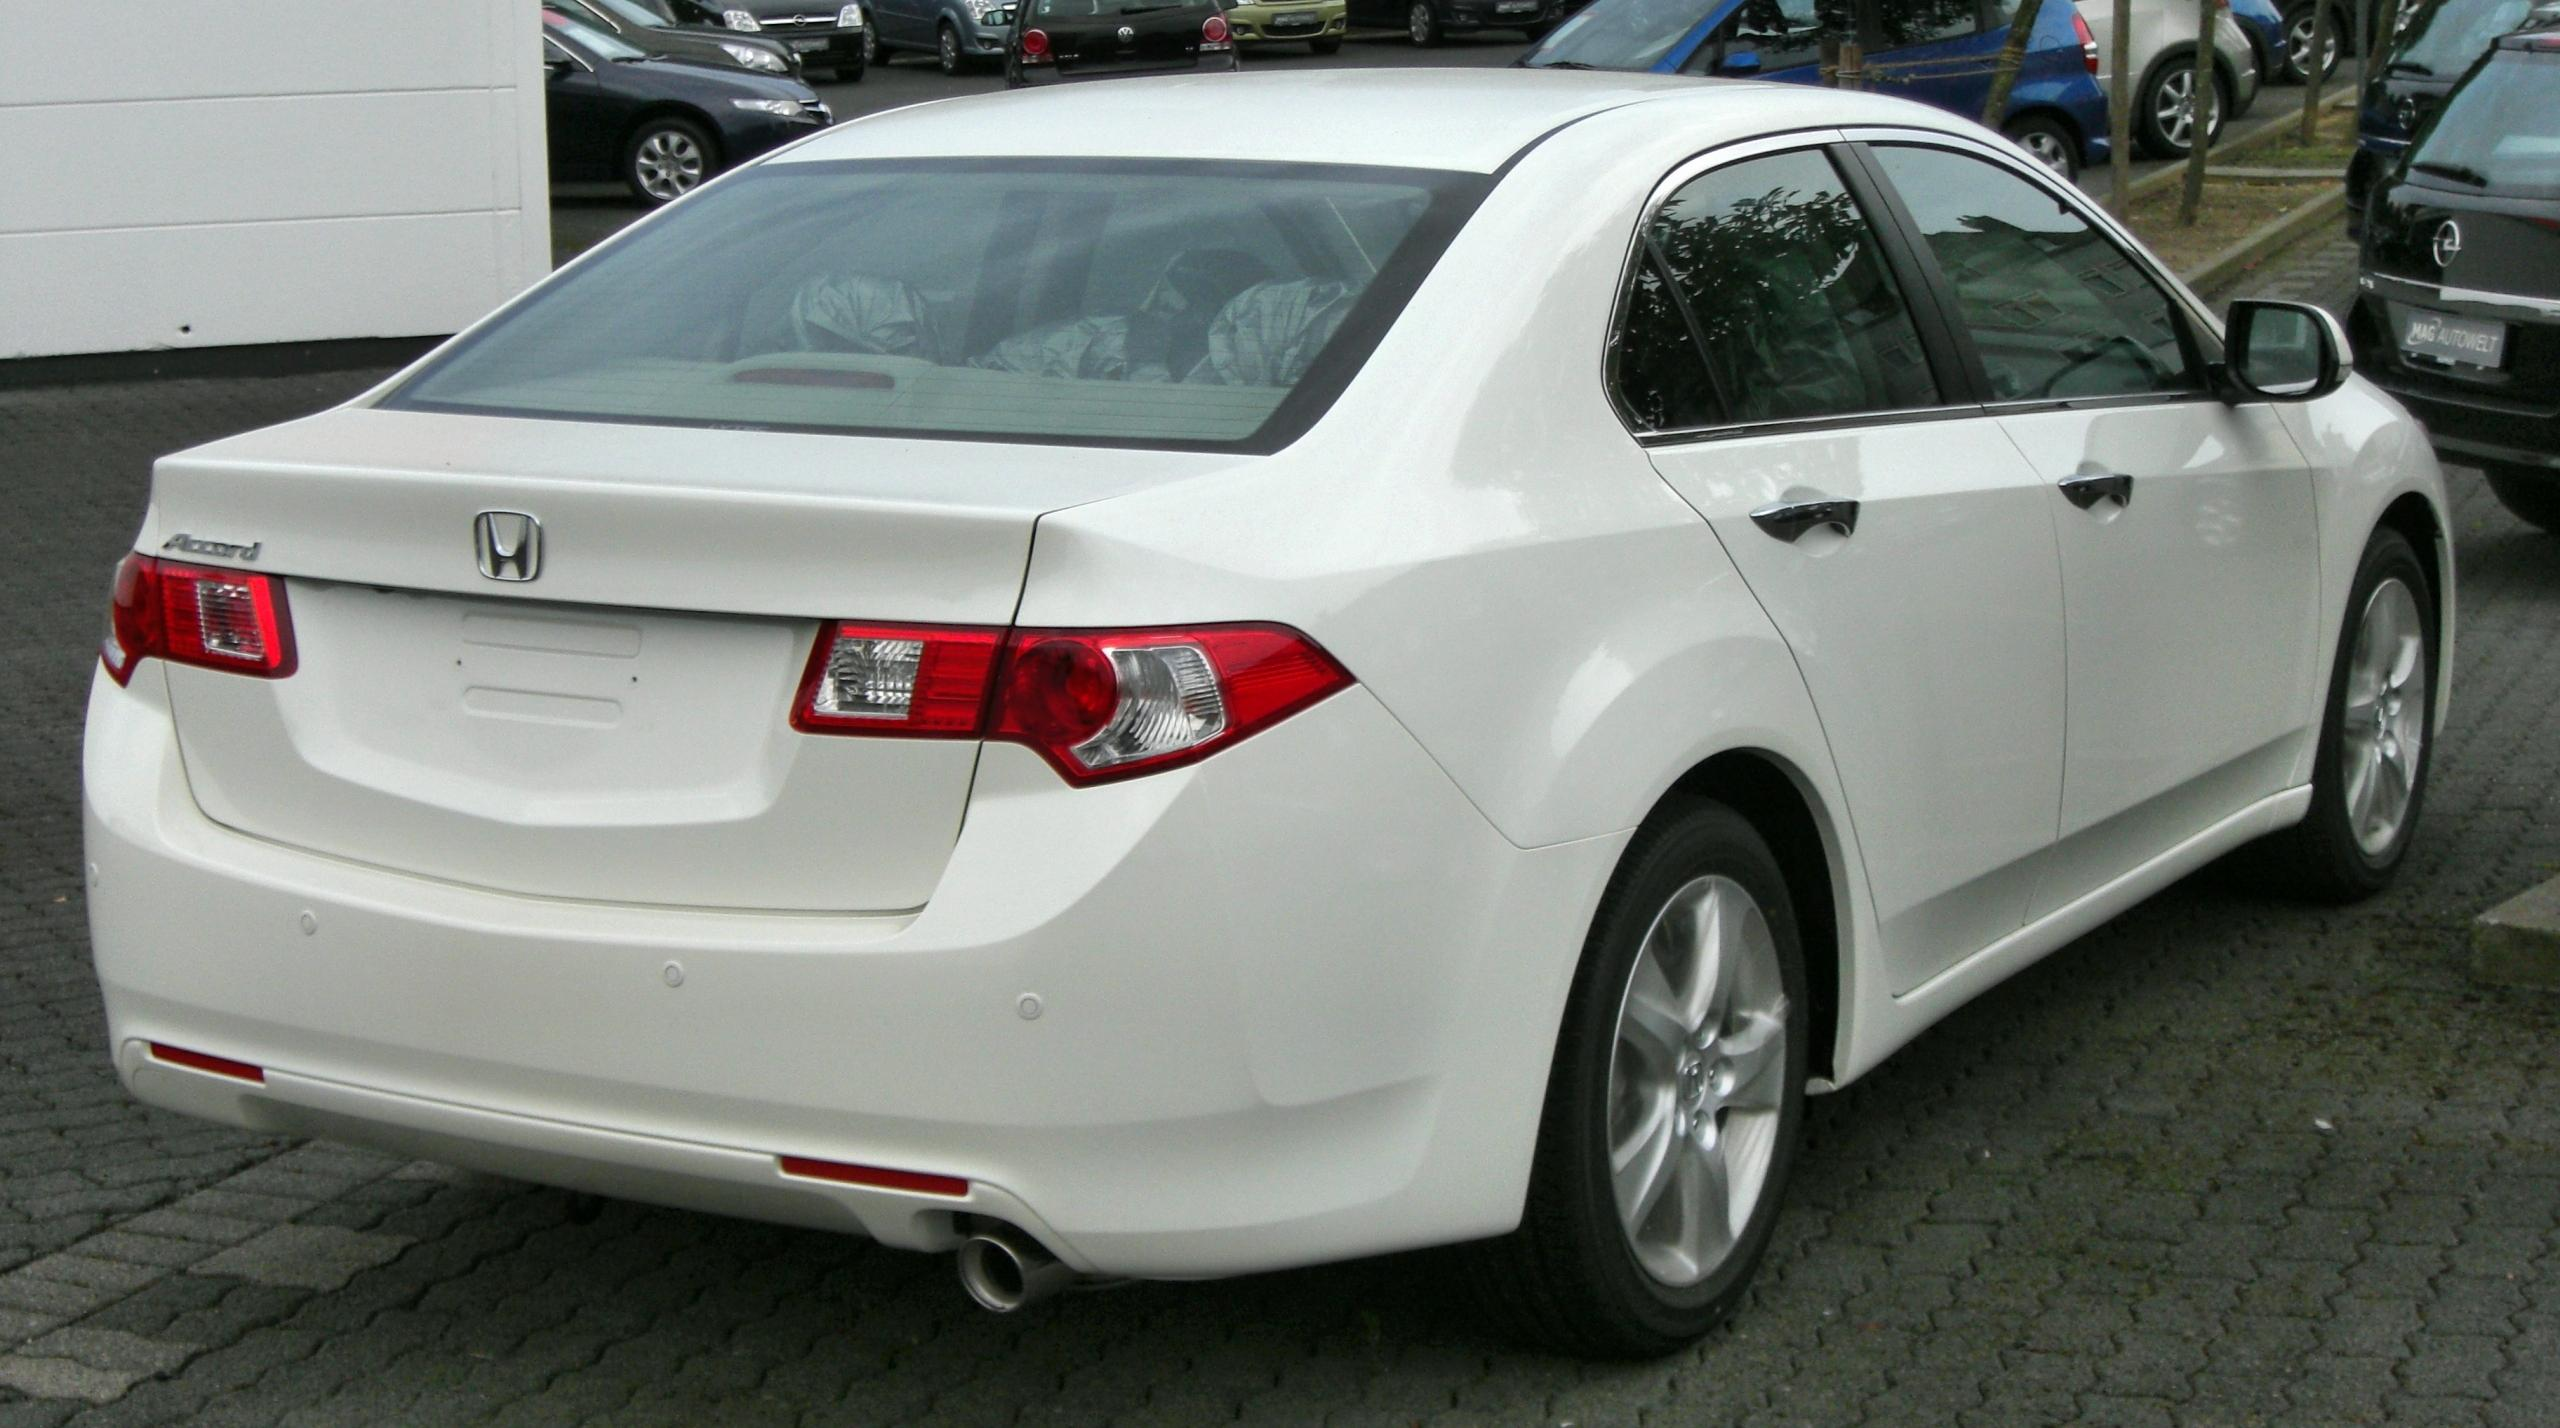 File:Honda Accord (2008) rear.JPG - Wikimedia Commons